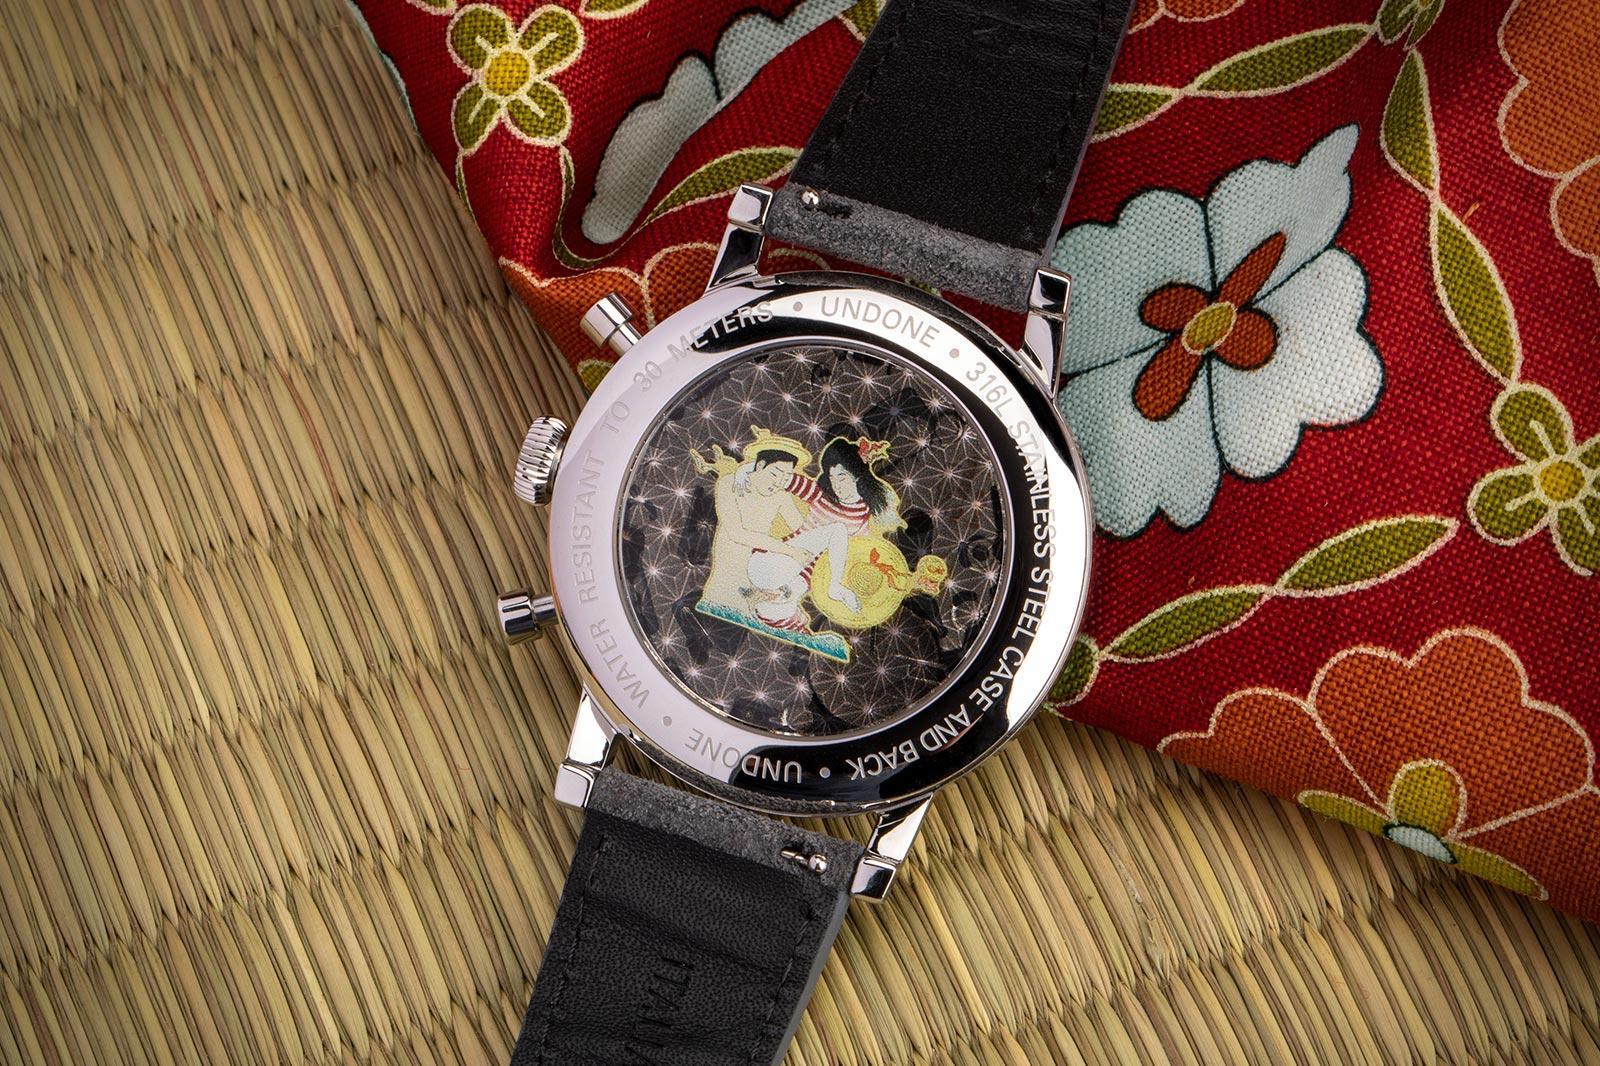 UNDONE Shunga Collection